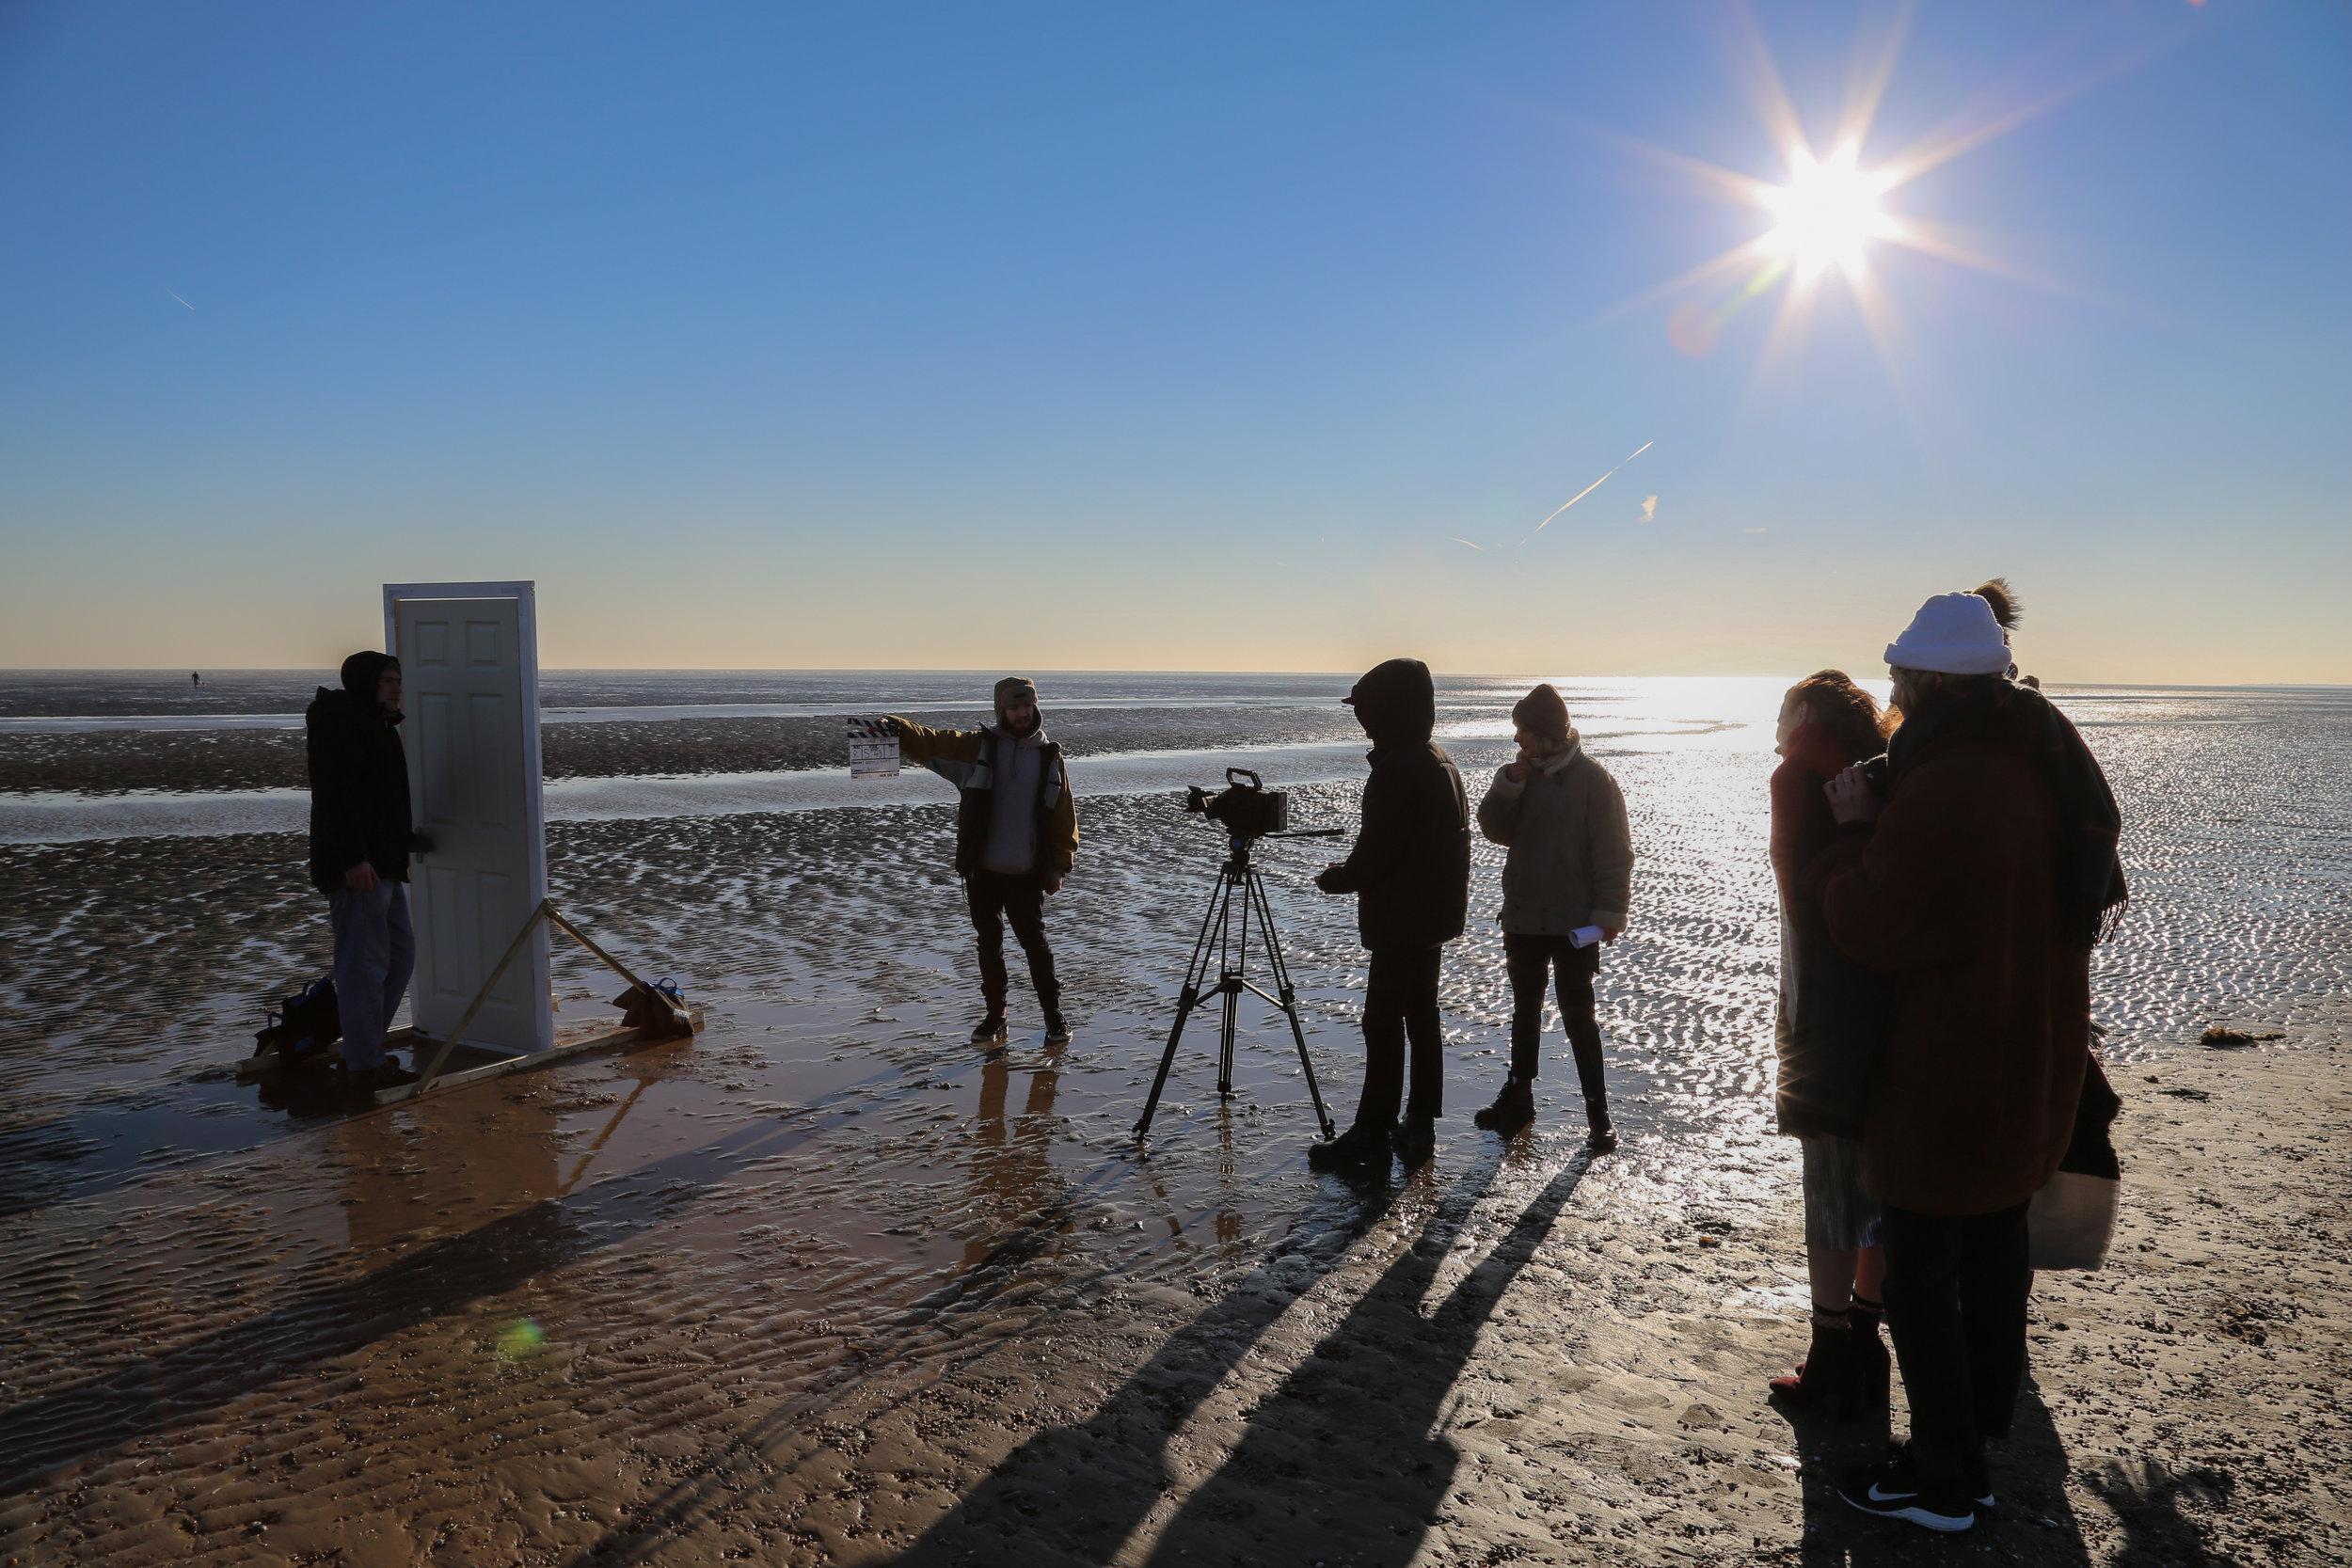 Scene 5, Romney Sands, Jess, Eliott, Harlie, Florence, Tilly, Louis, Prop Door. Photographer: jessisteadman@gmail.com-6.jpg